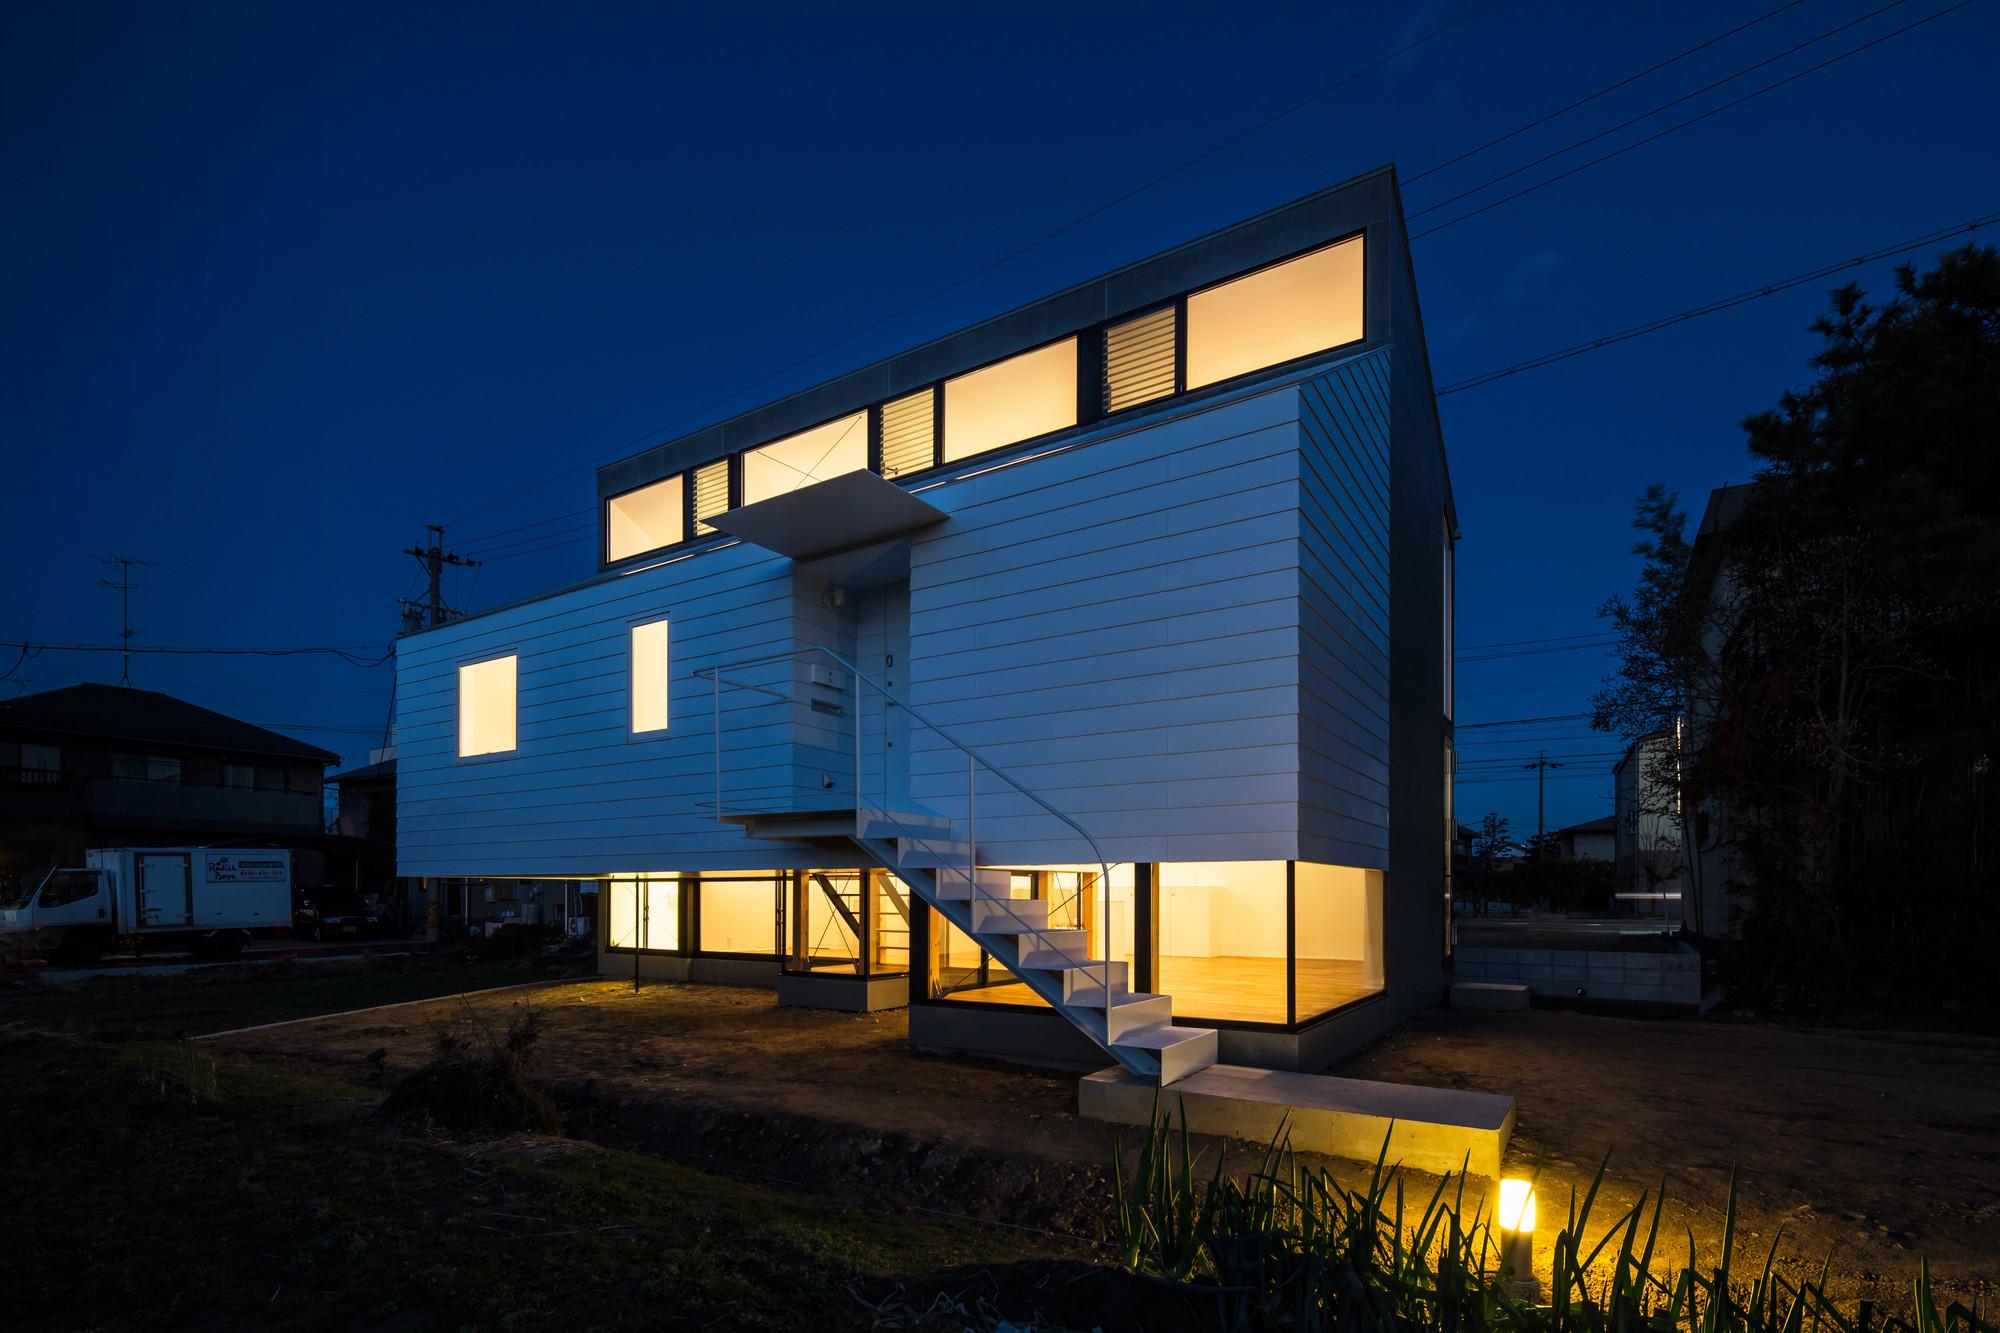 Kawate gyvenamasis namas